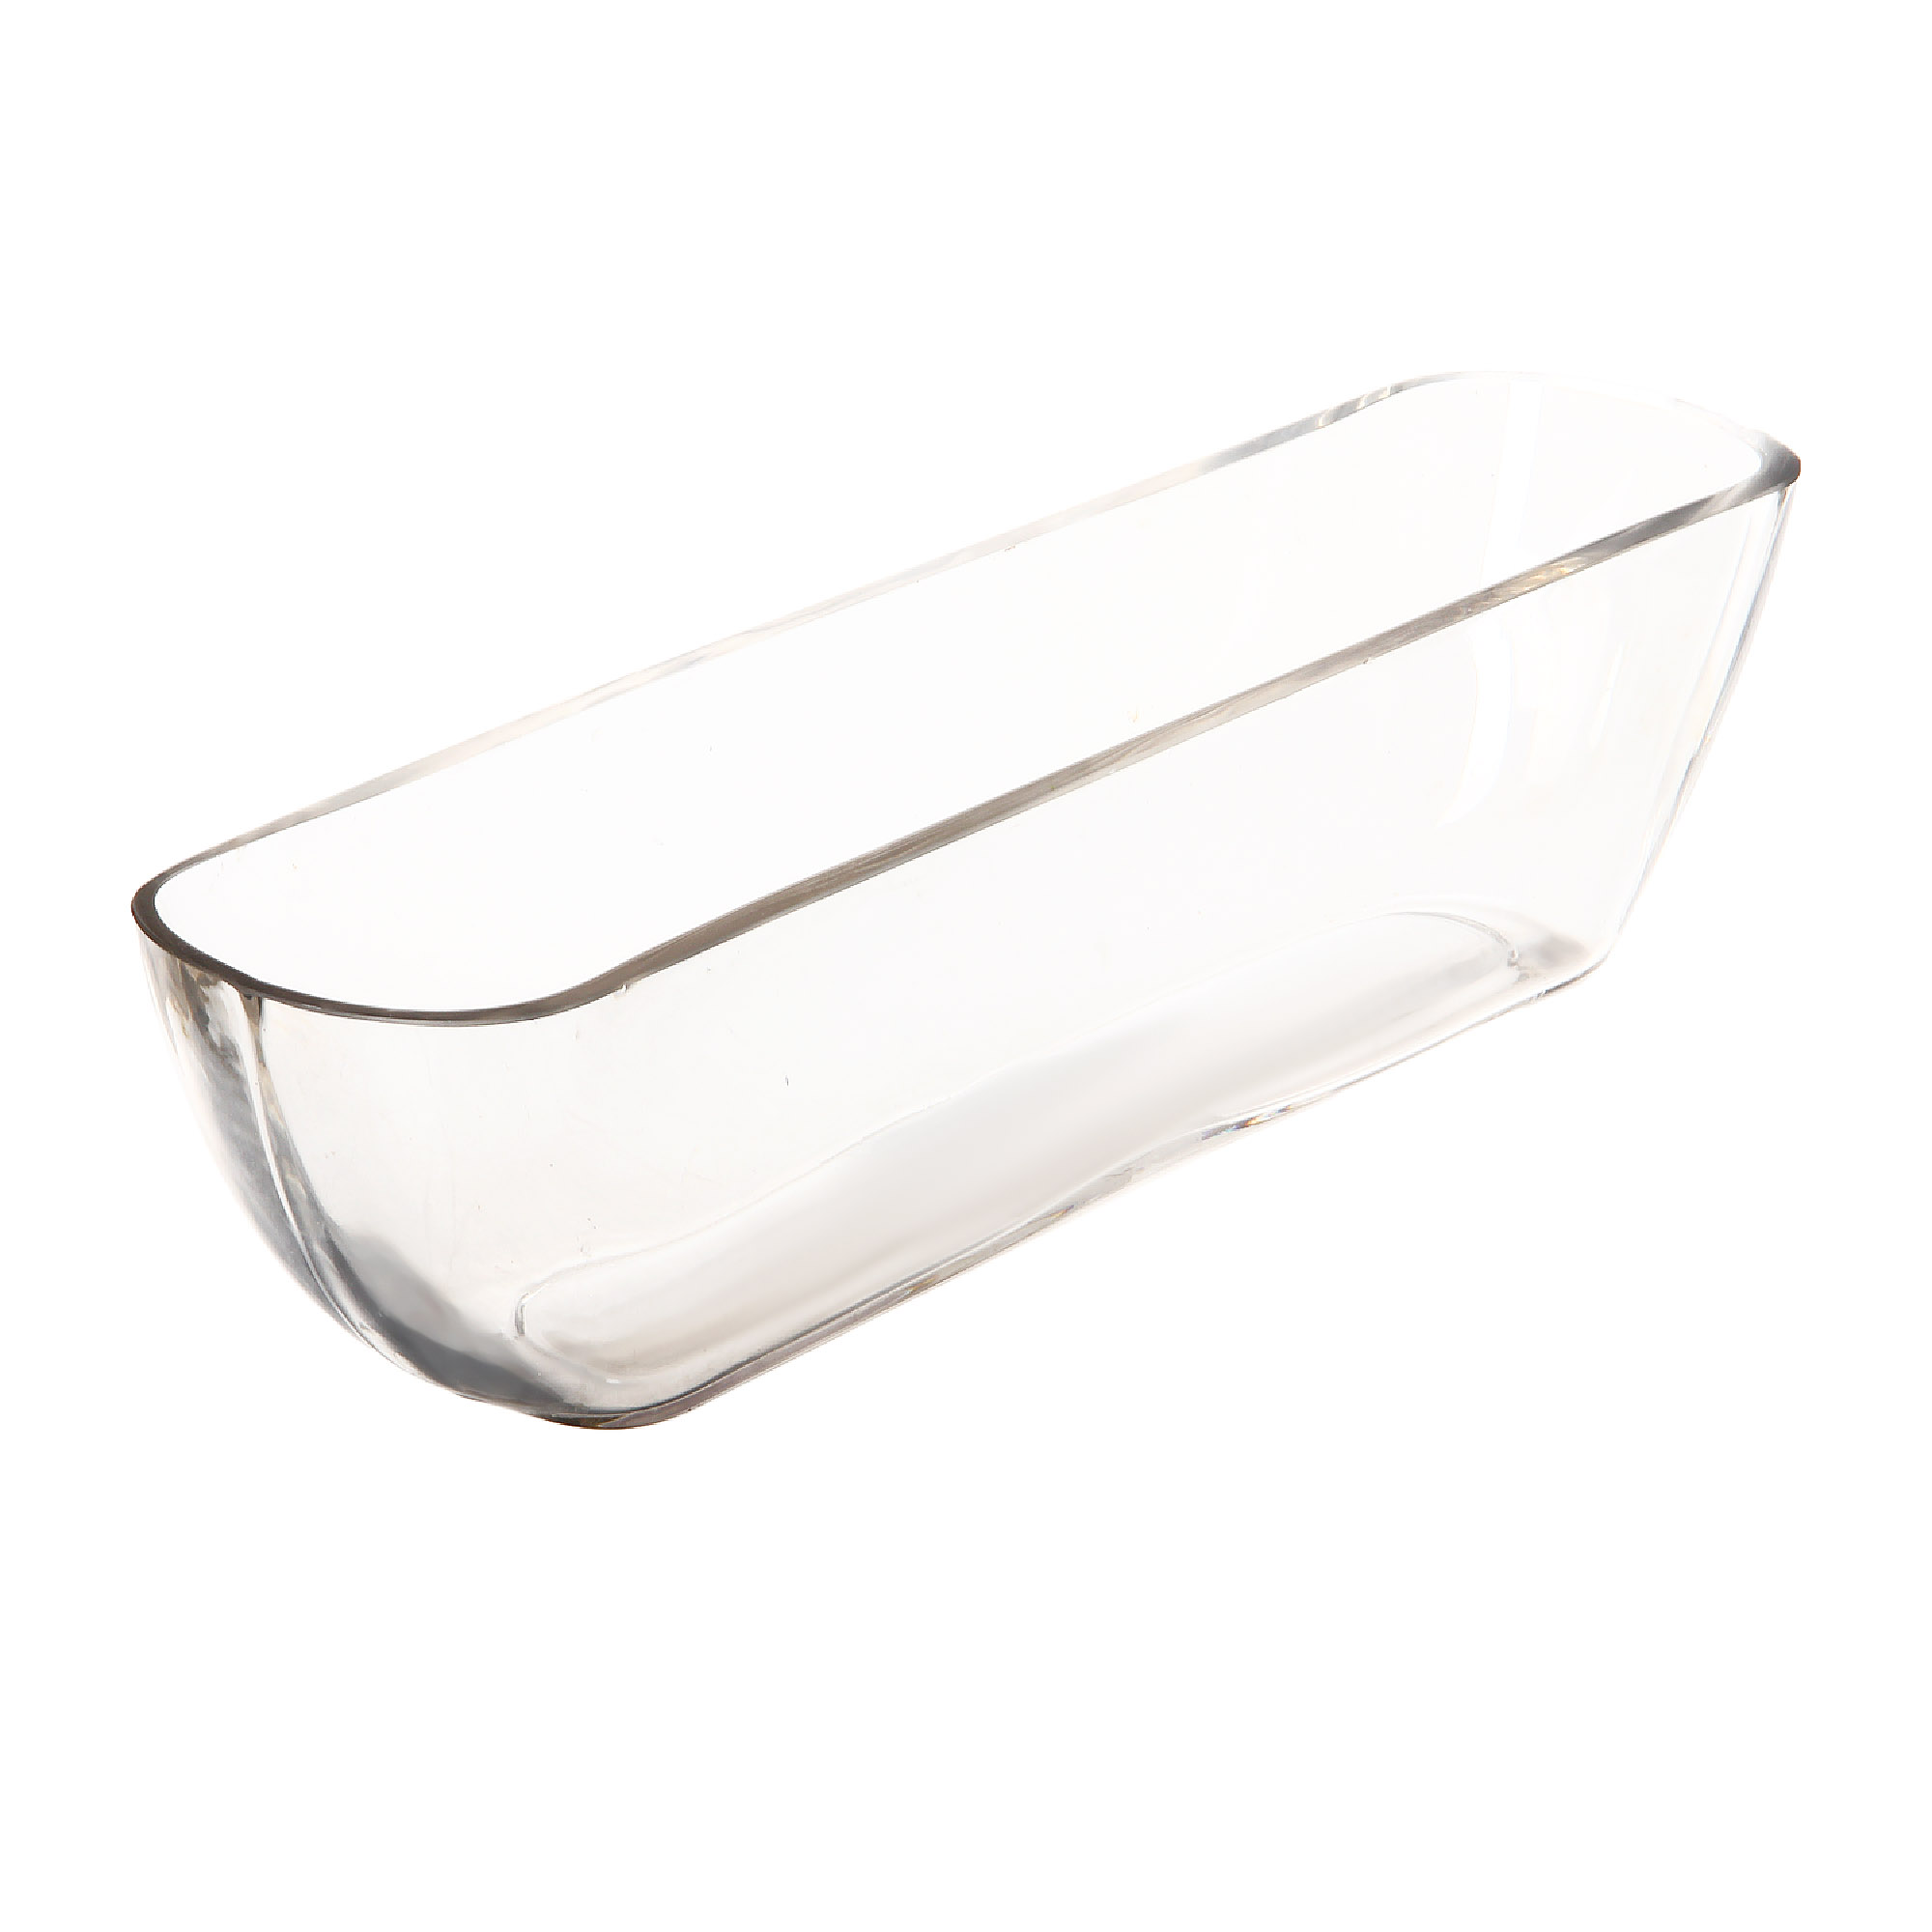 Ваза Bx glass лодочка малая 40см